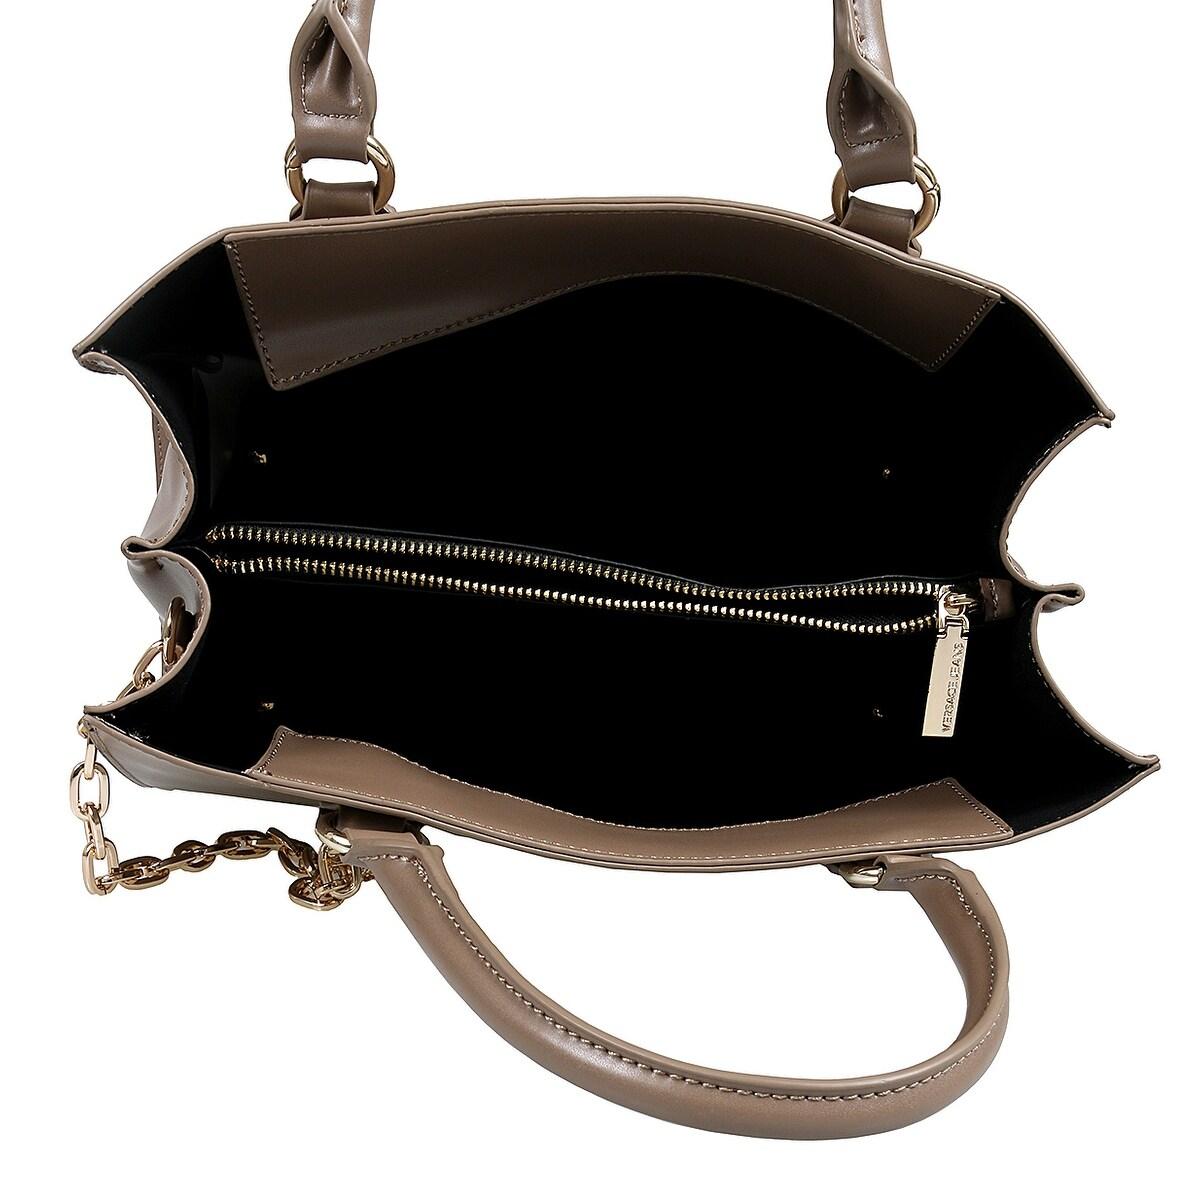 f8a987393b97 Versace EE1VSBBG7 EMDU Taupe Satchel Bag - 12.25-8.25-6